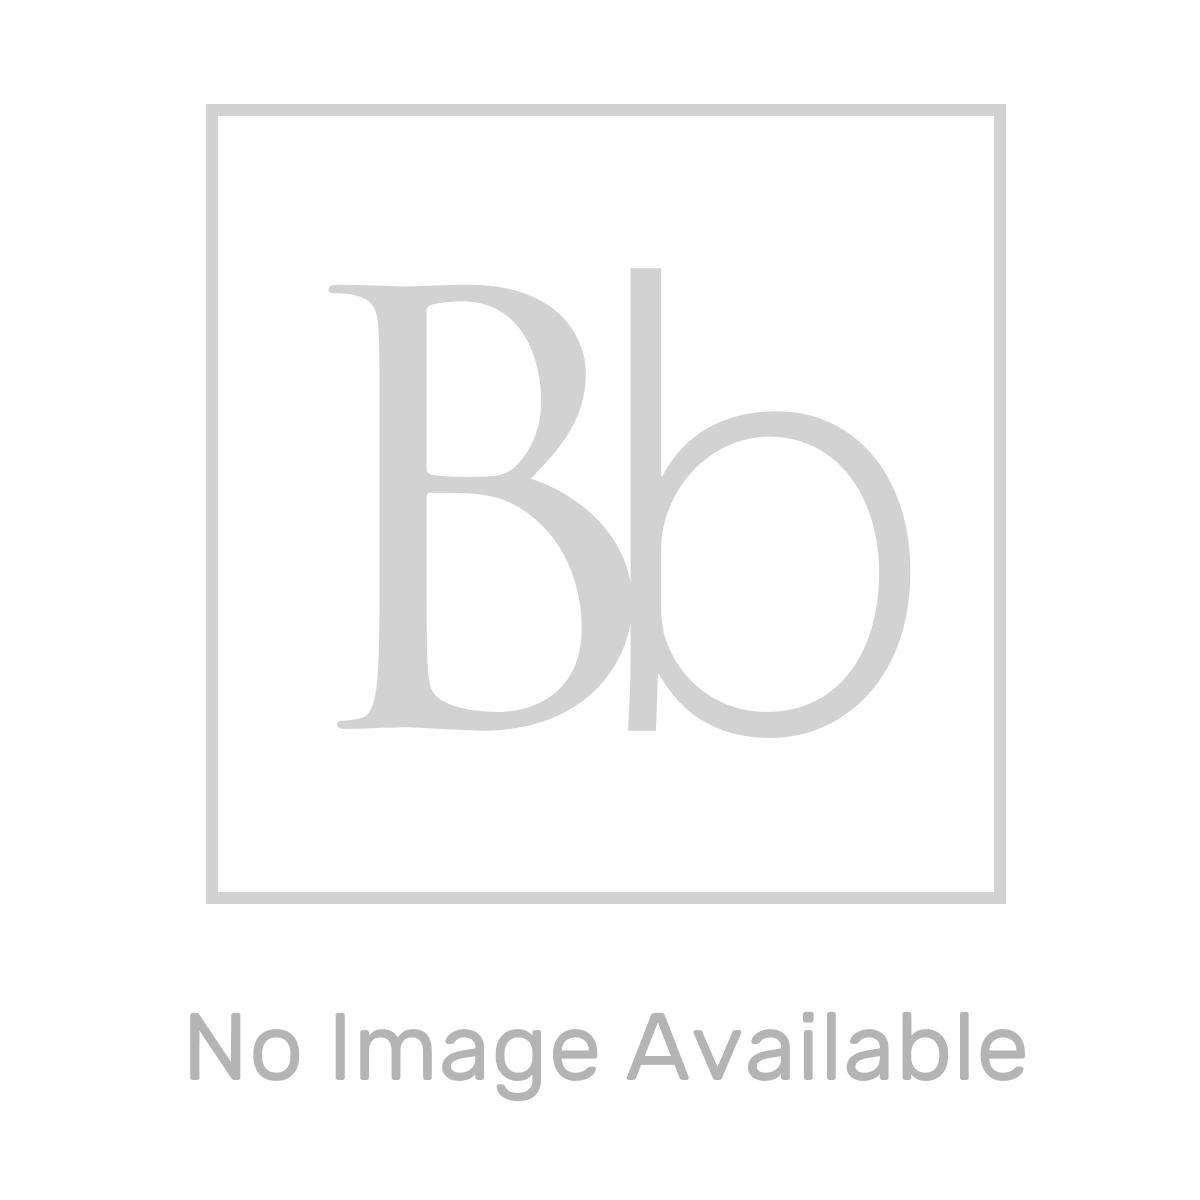 Aquadart White Slate Shower Tray 1000 x 900mm Lifestyle